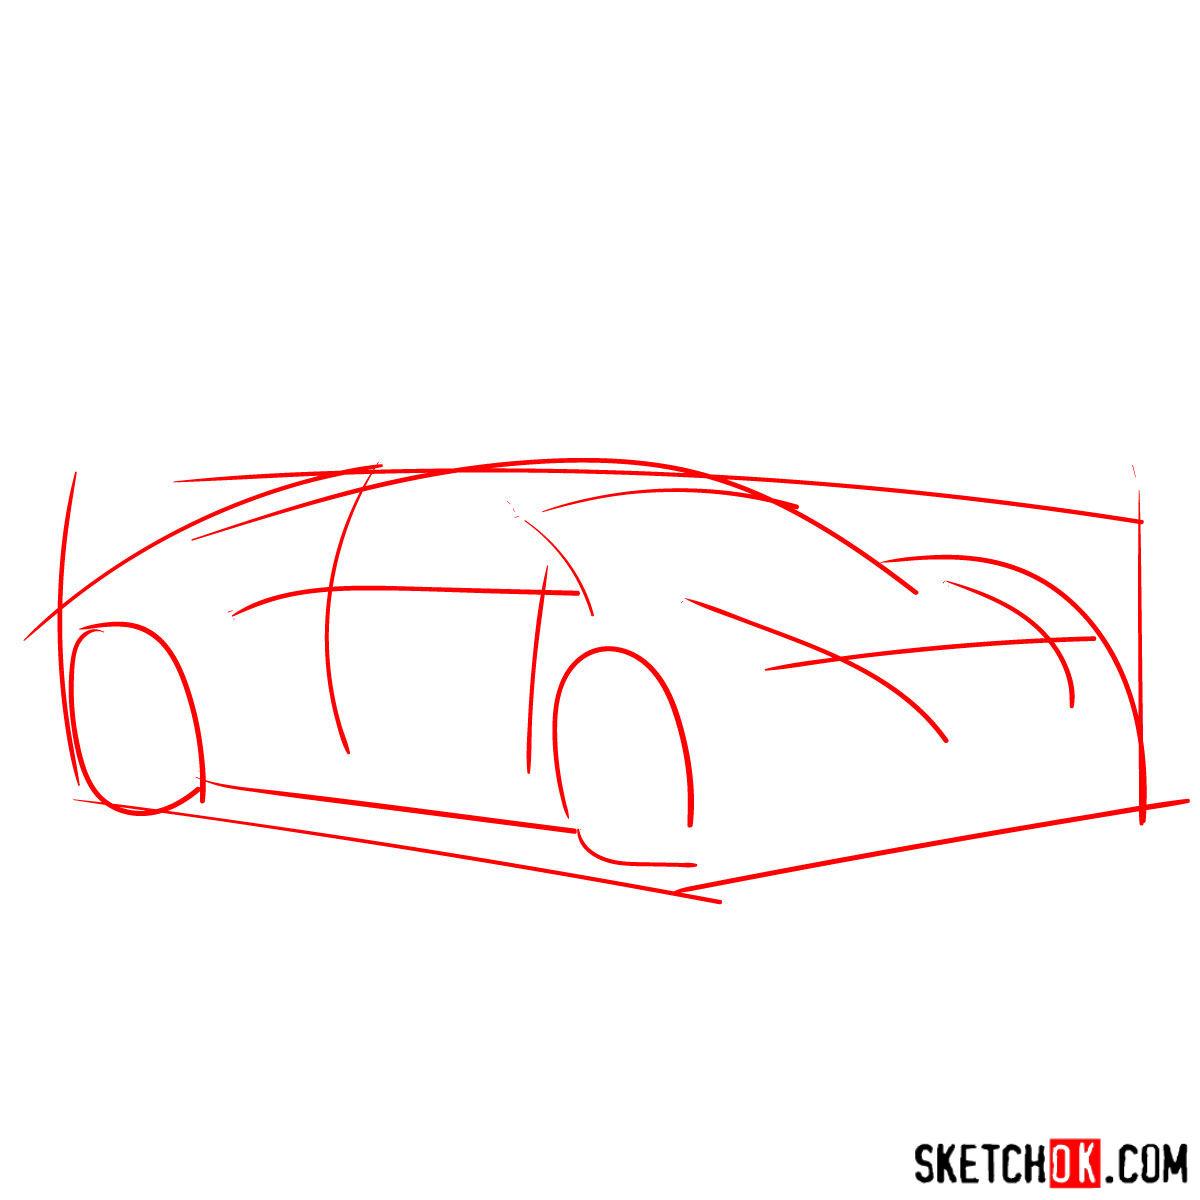 How to draw Bugatti Veyron 16.4 Super Sport - step 01